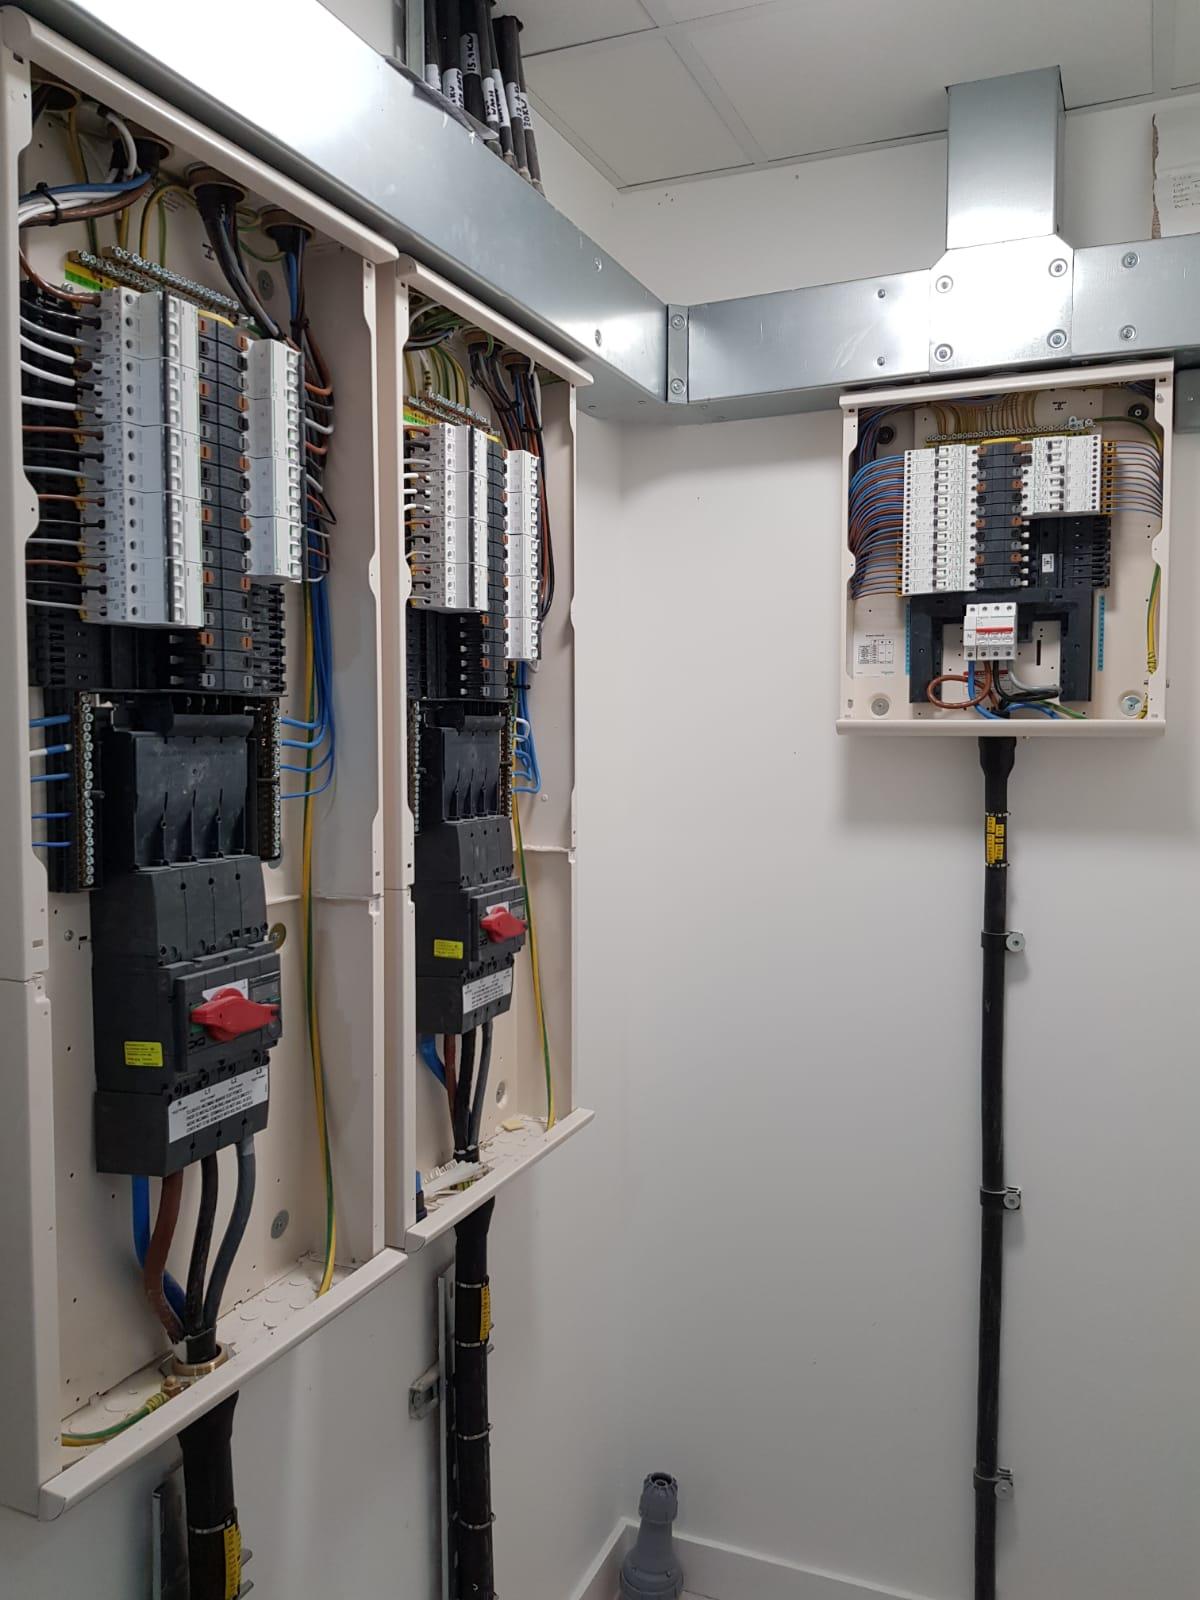 Mains installation